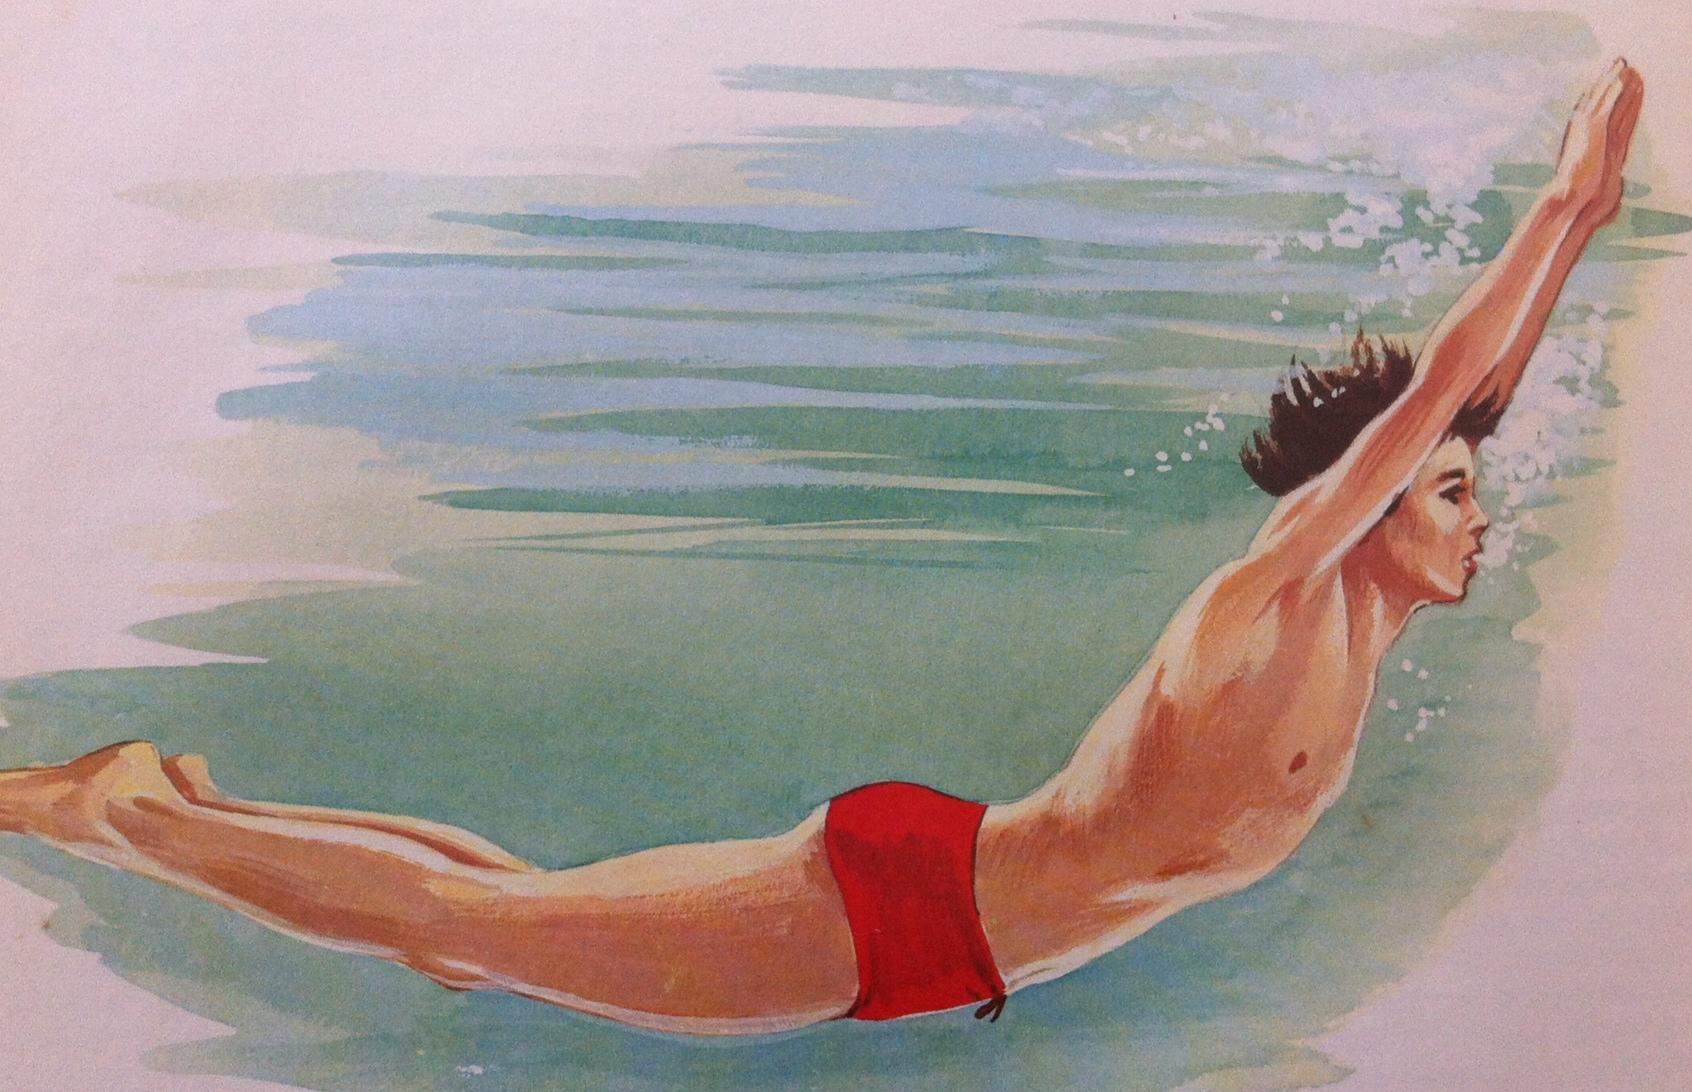 underwater dive scene drawing